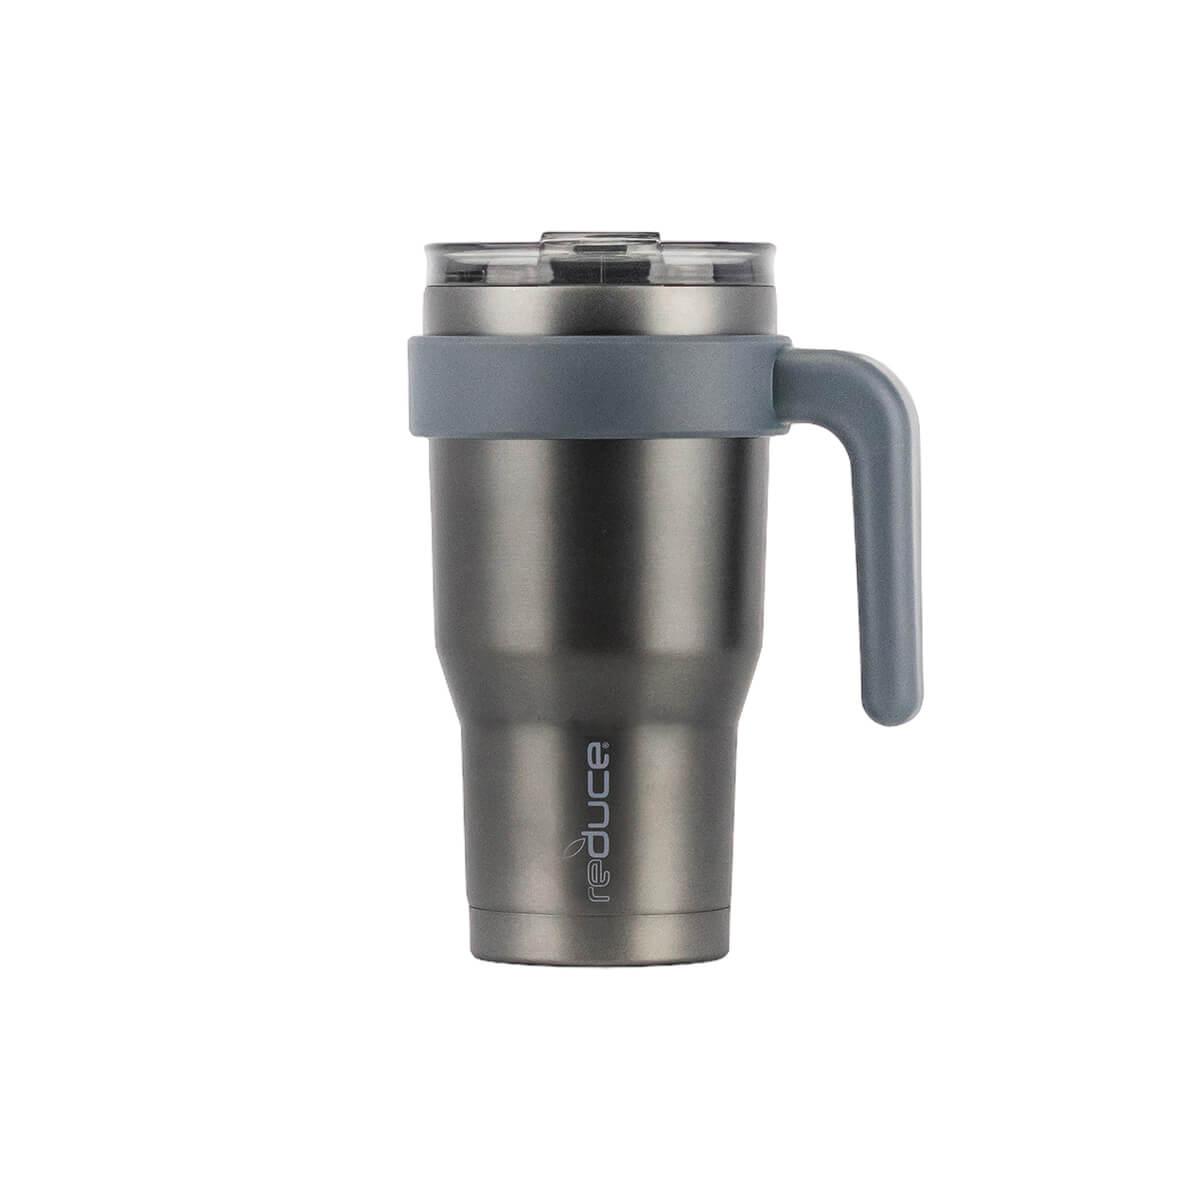 Mug - Hot1 - Vacuum Insulated- 20 oz - Charcoal